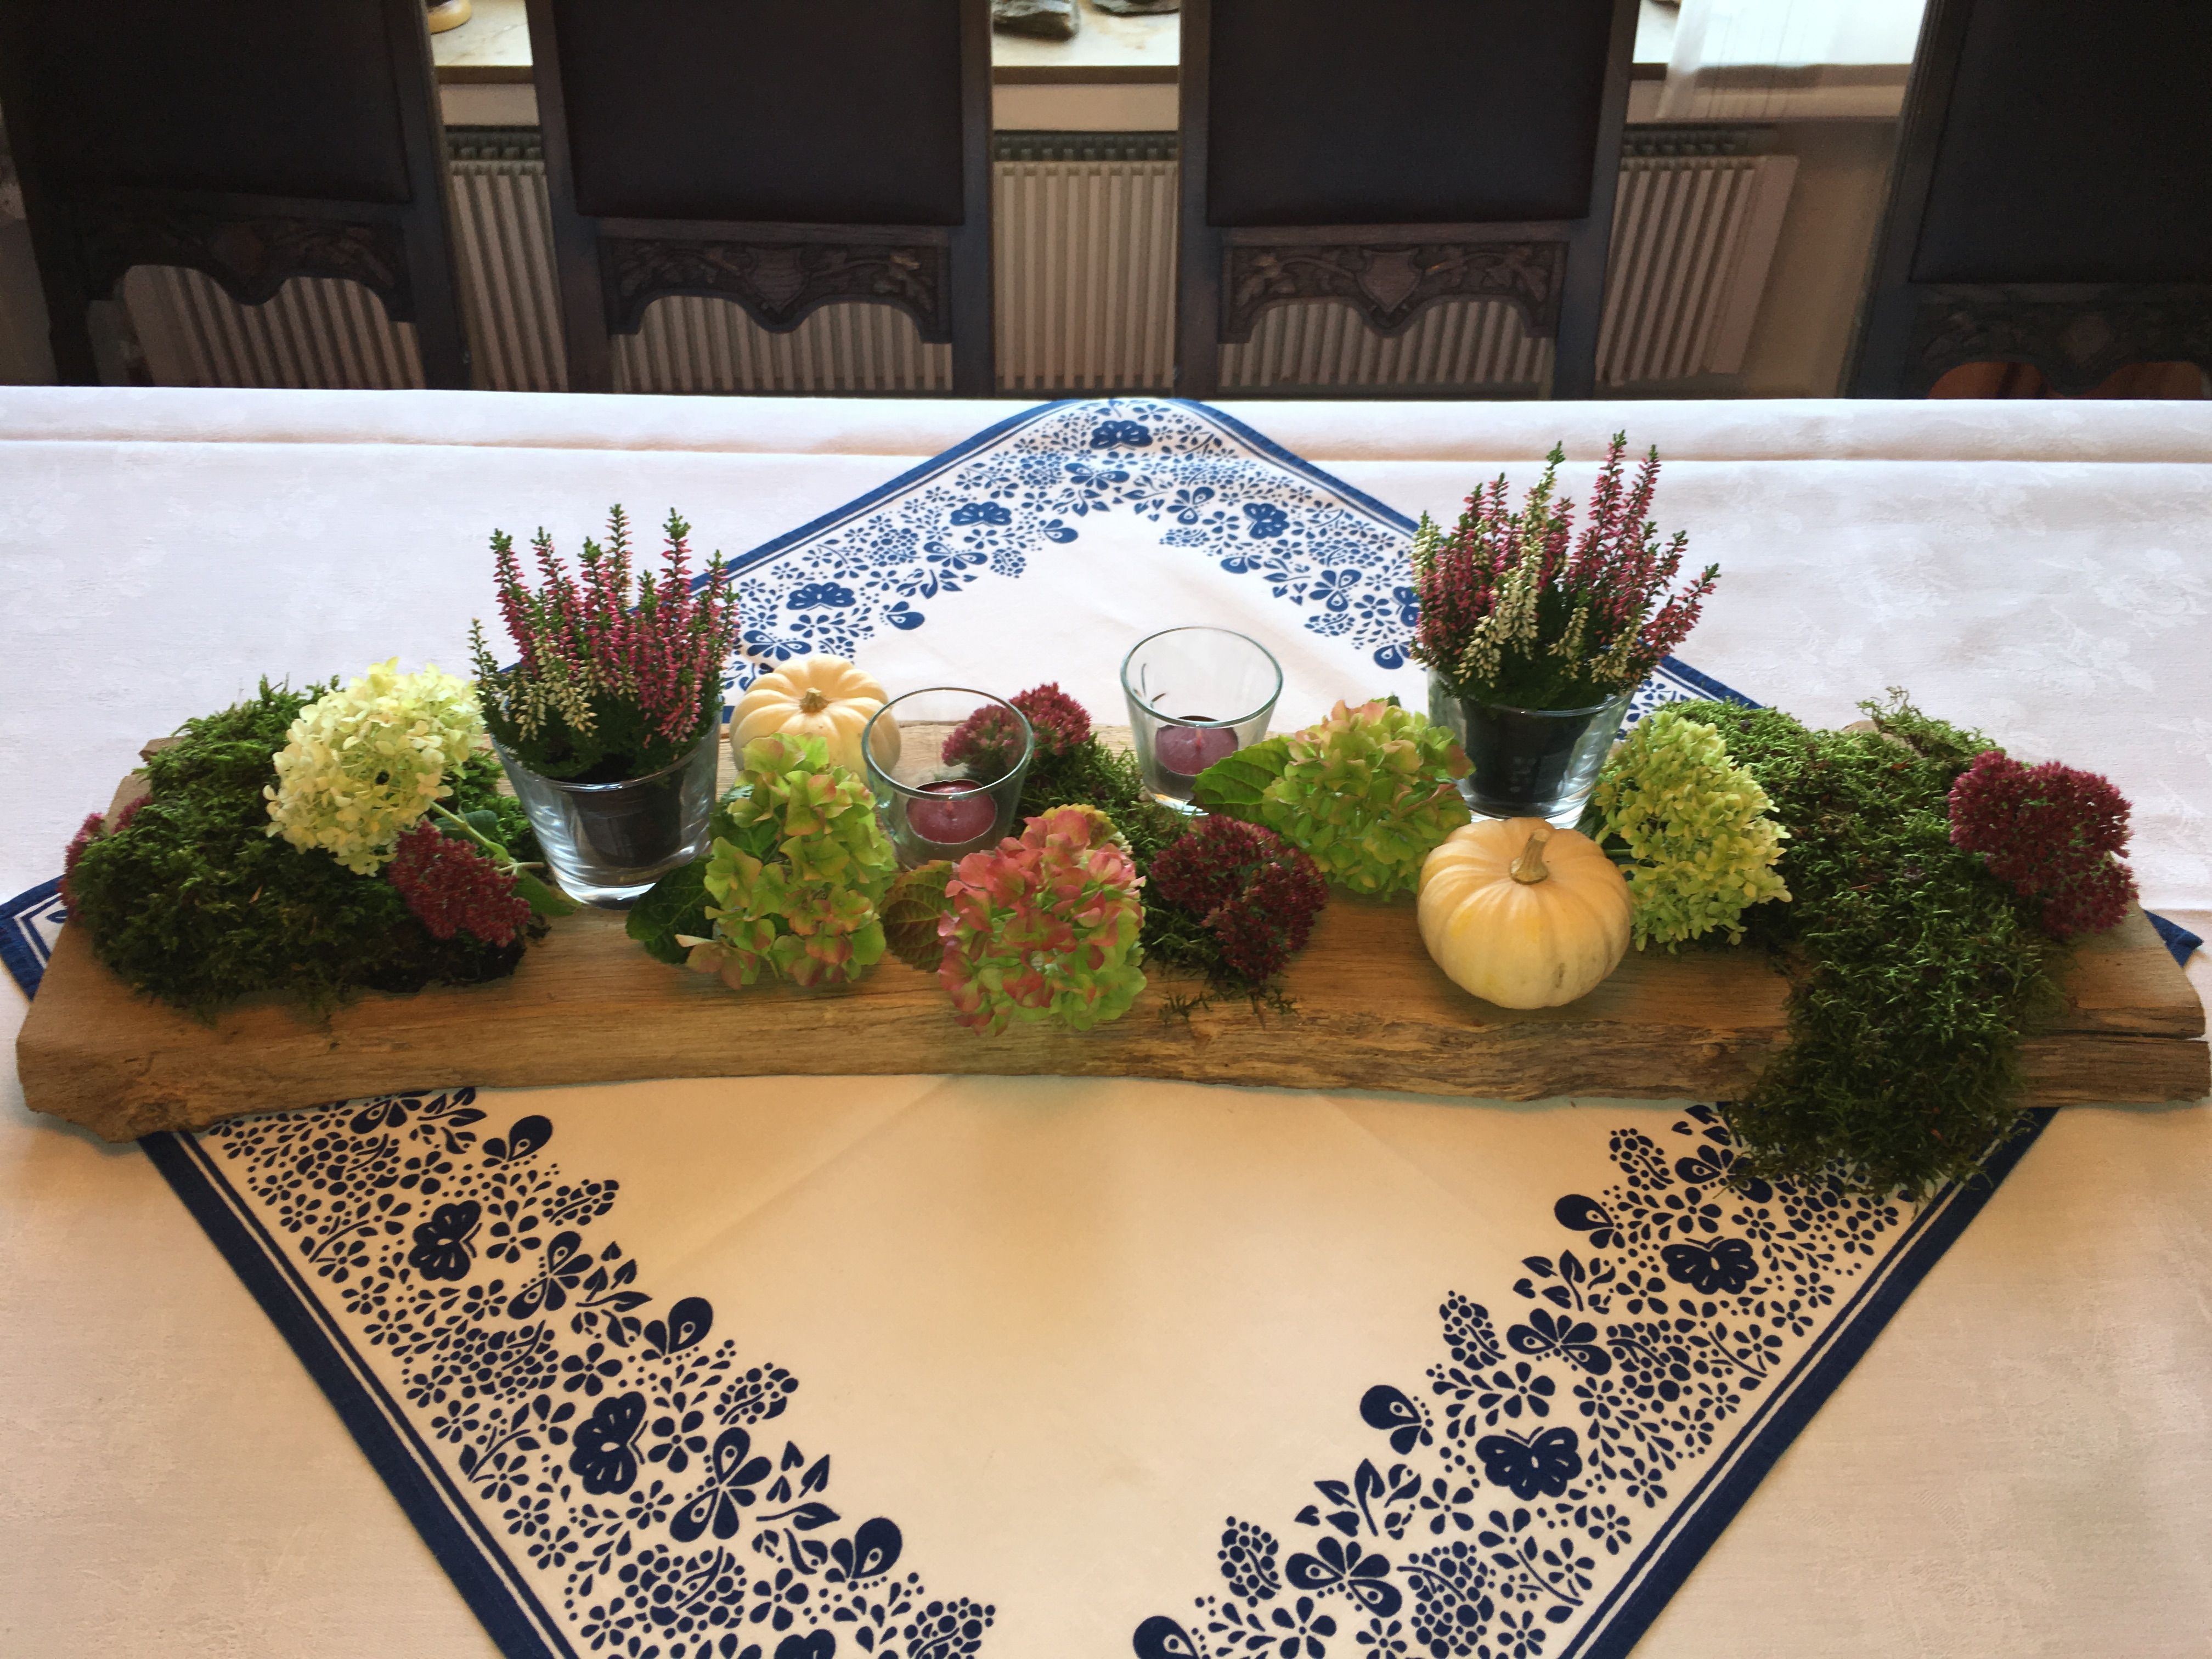 tischdeko zum 80 geburtstag g steempfang herbstdeko pinterest table decorations. Black Bedroom Furniture Sets. Home Design Ideas